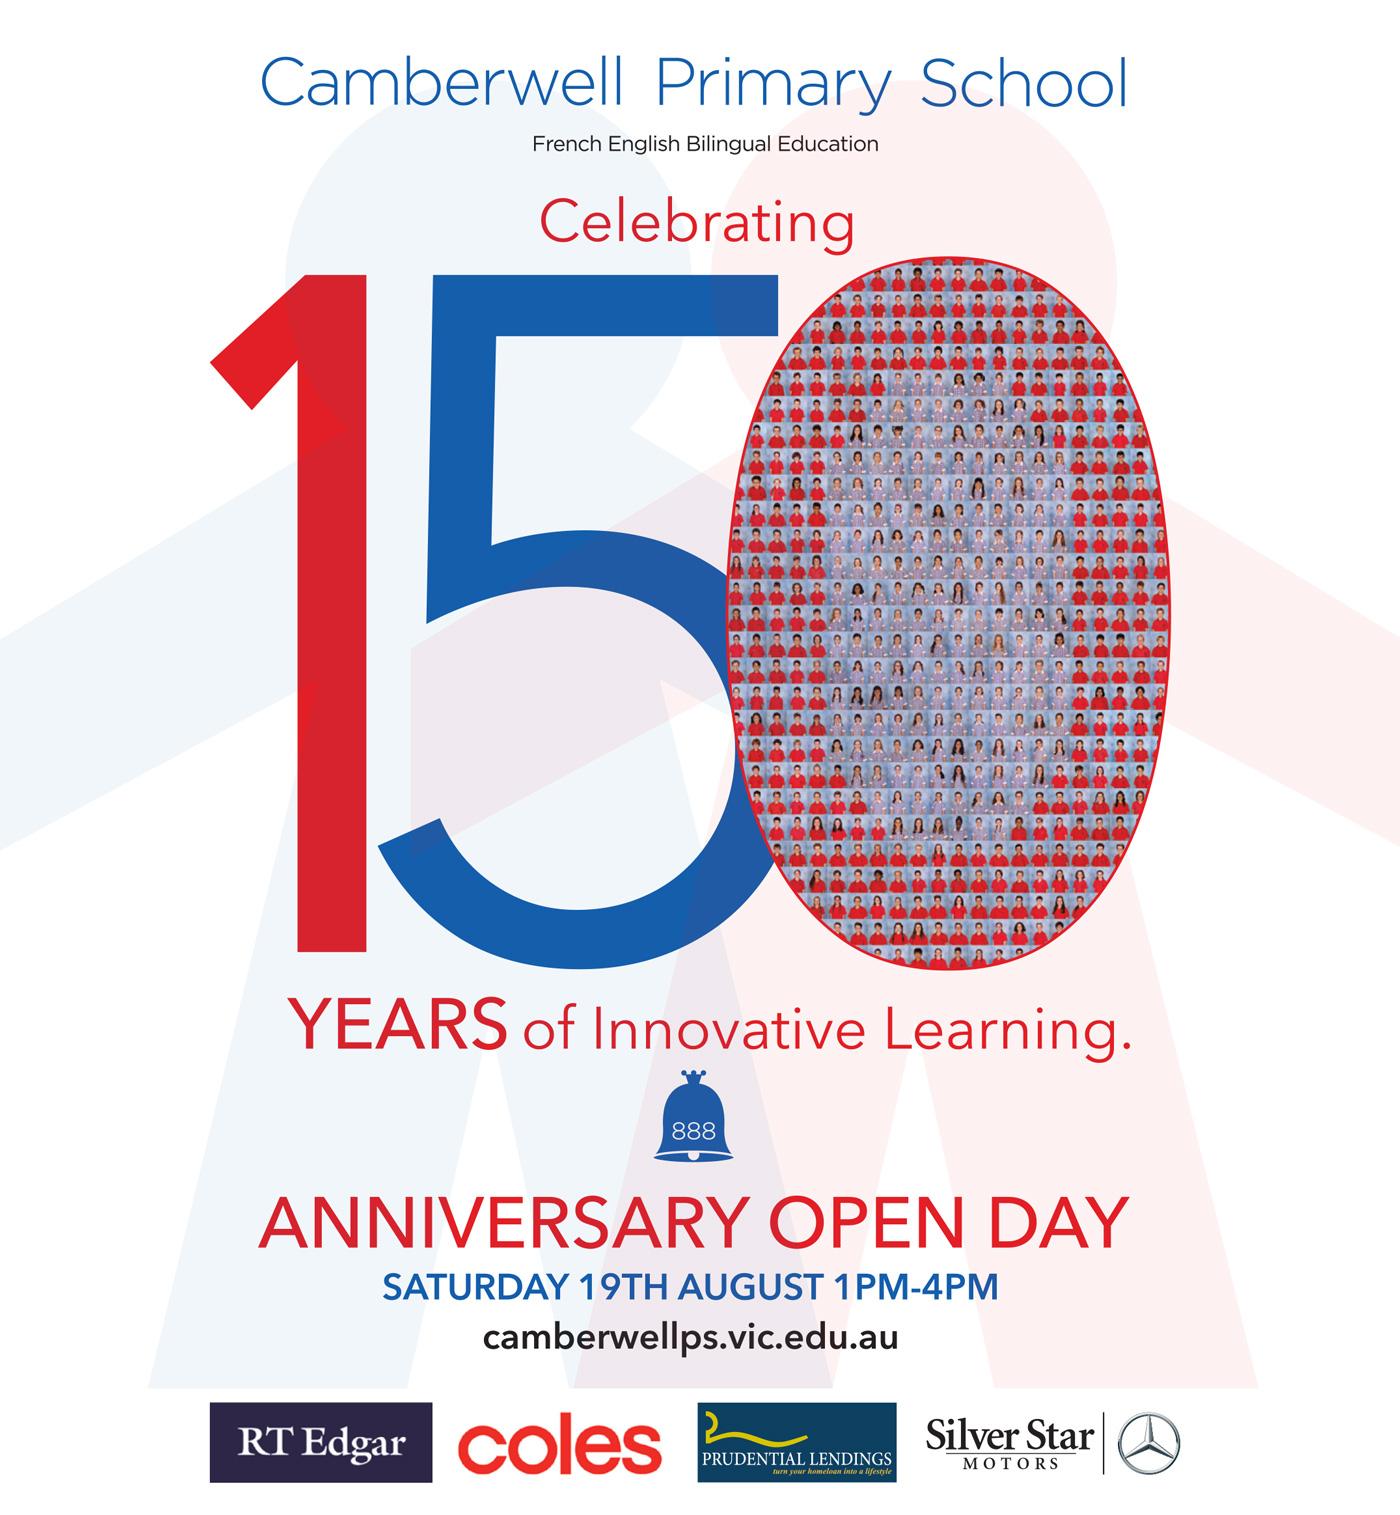 Camberwell Primary School 150 Years Anniversary Open Day